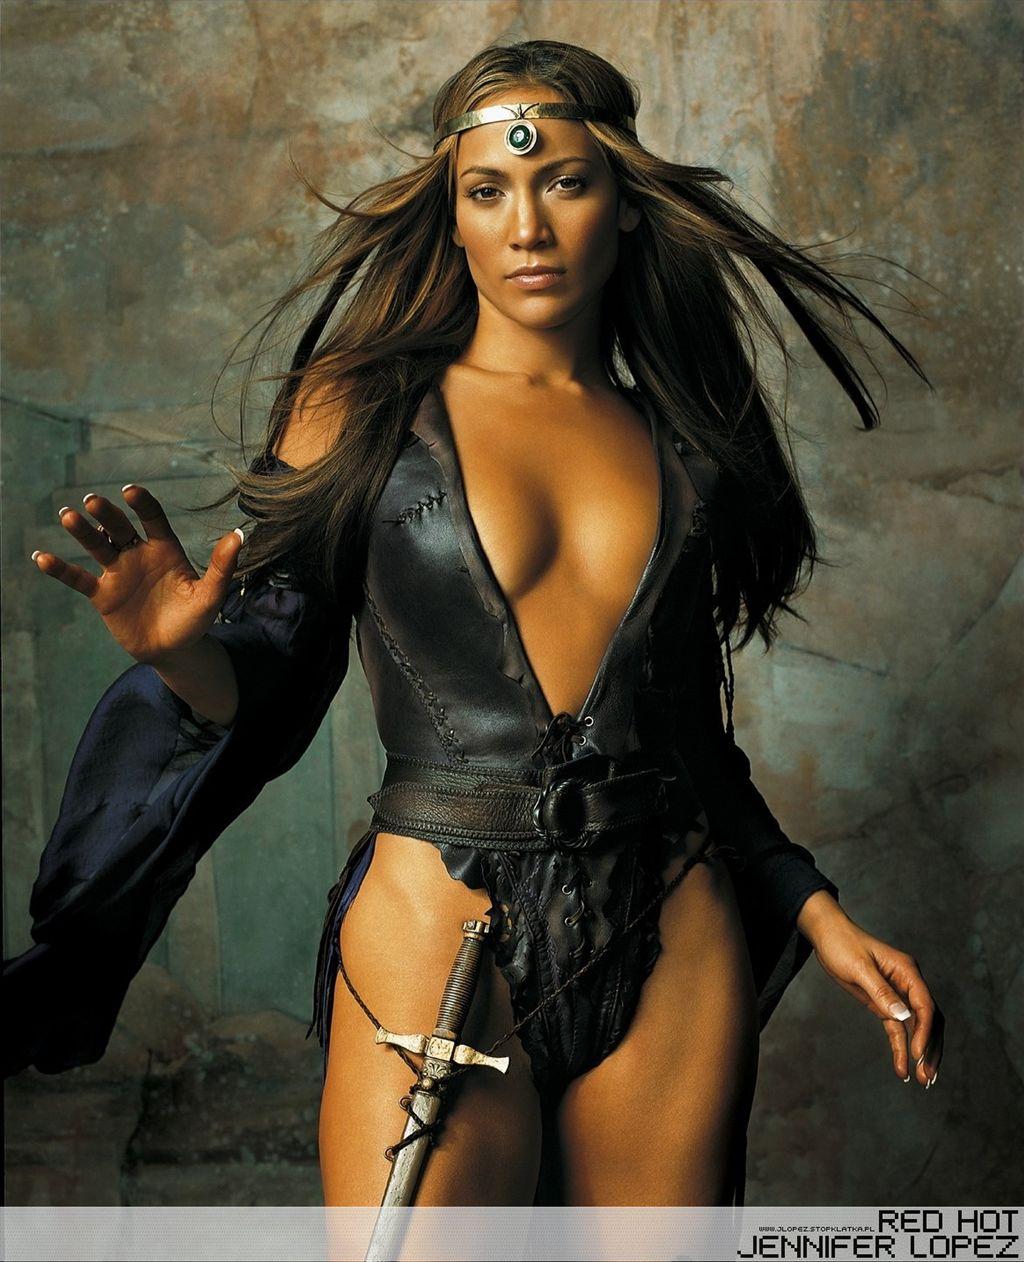 http://2.bp.blogspot.com/_uI7MXkSOmHc/SZA2XVMSlAI/AAAAAAAAAQQ/wiHhI-vhYDs/s1600/Jennifer_Lopez_with_a_scooter1.jpg